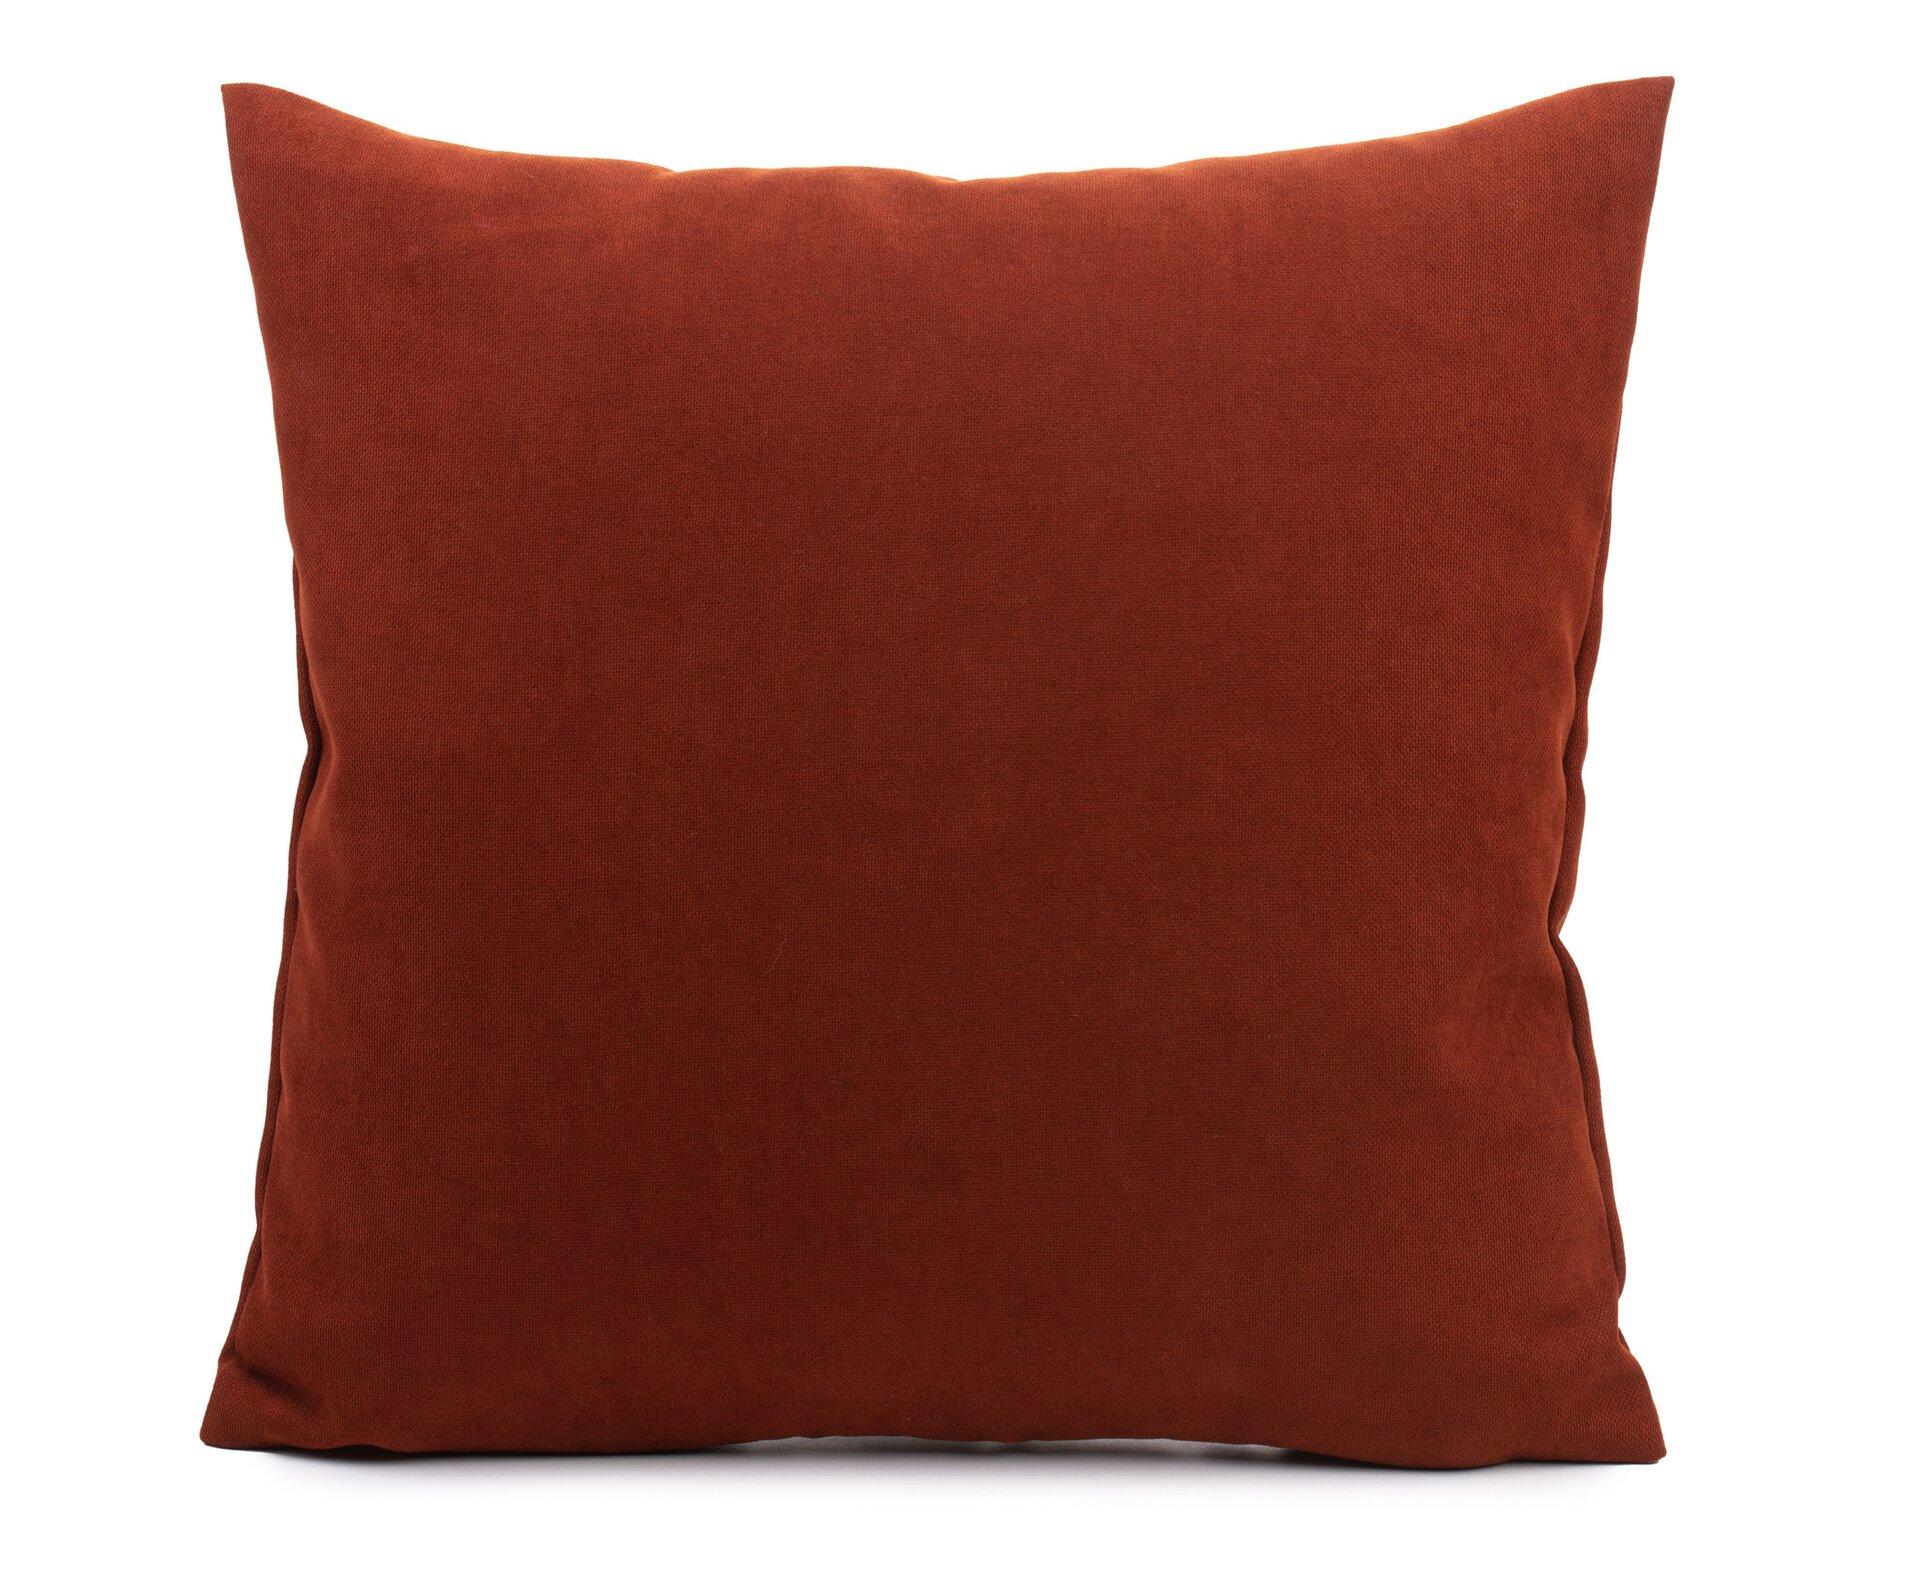 Kissenhülle Dante Ambiente Trendlife Textil braun 60 x 60 cm